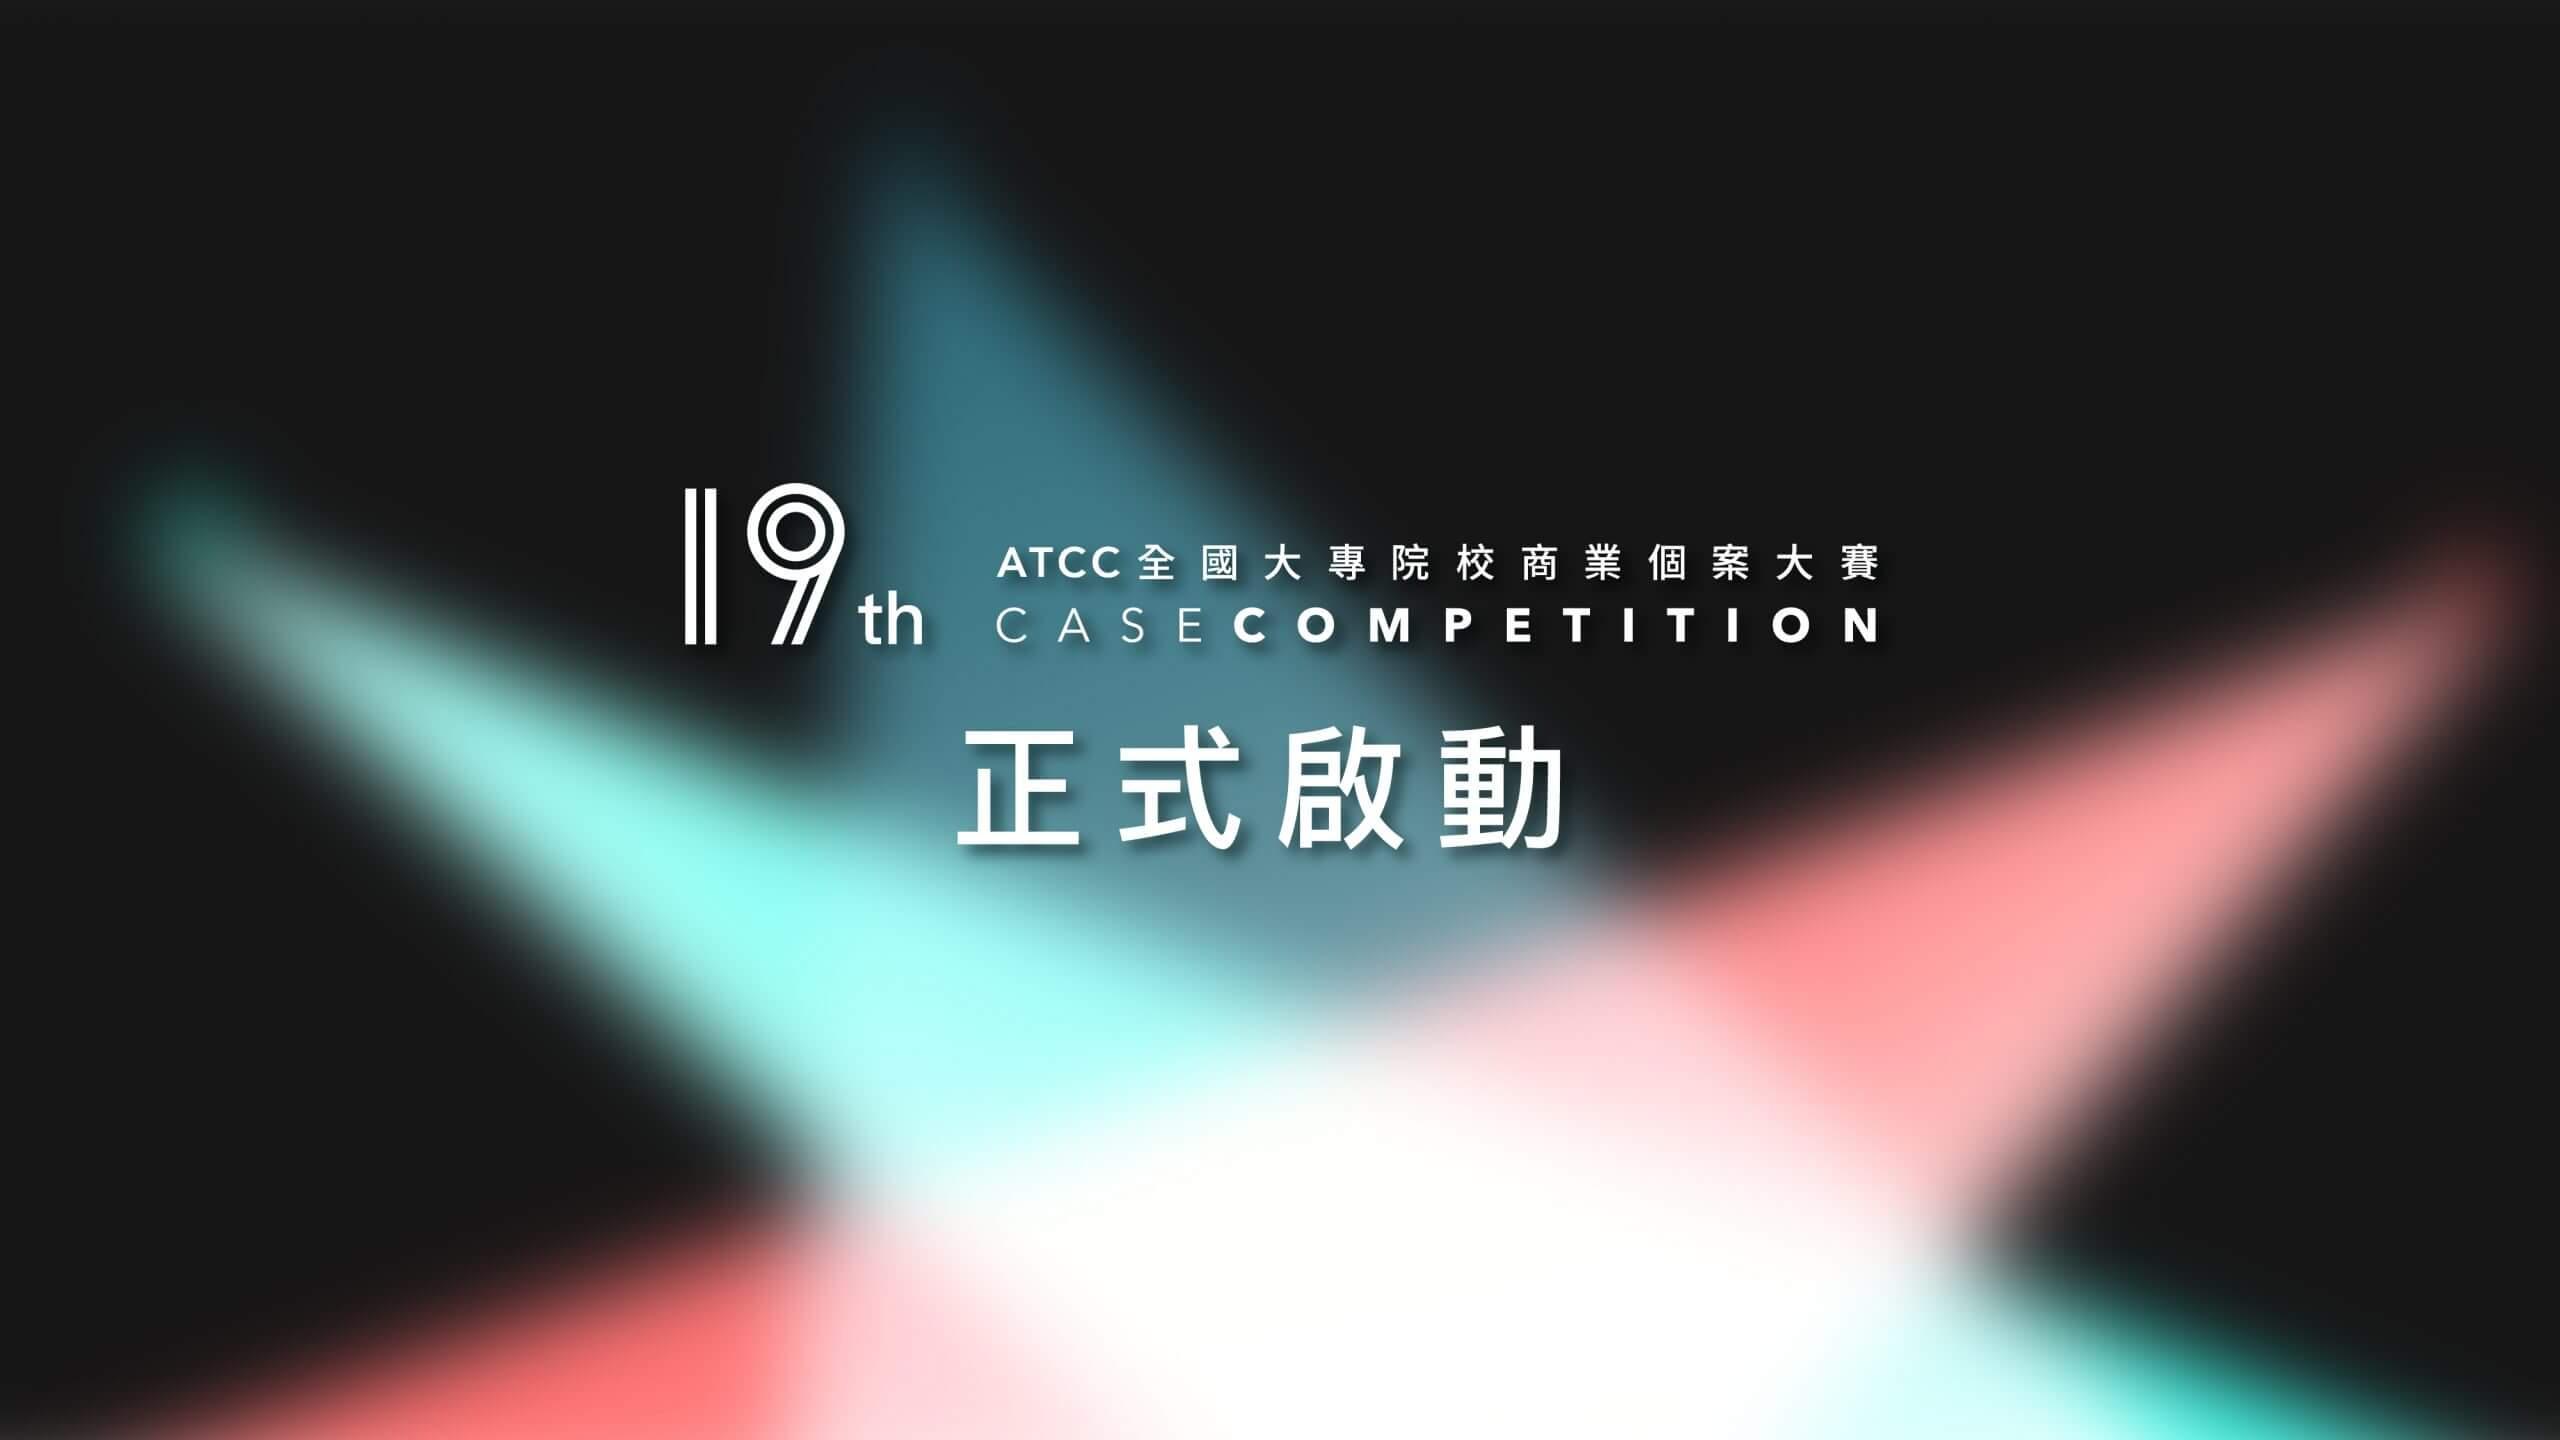 2021 19th ATCC 正式啟動!